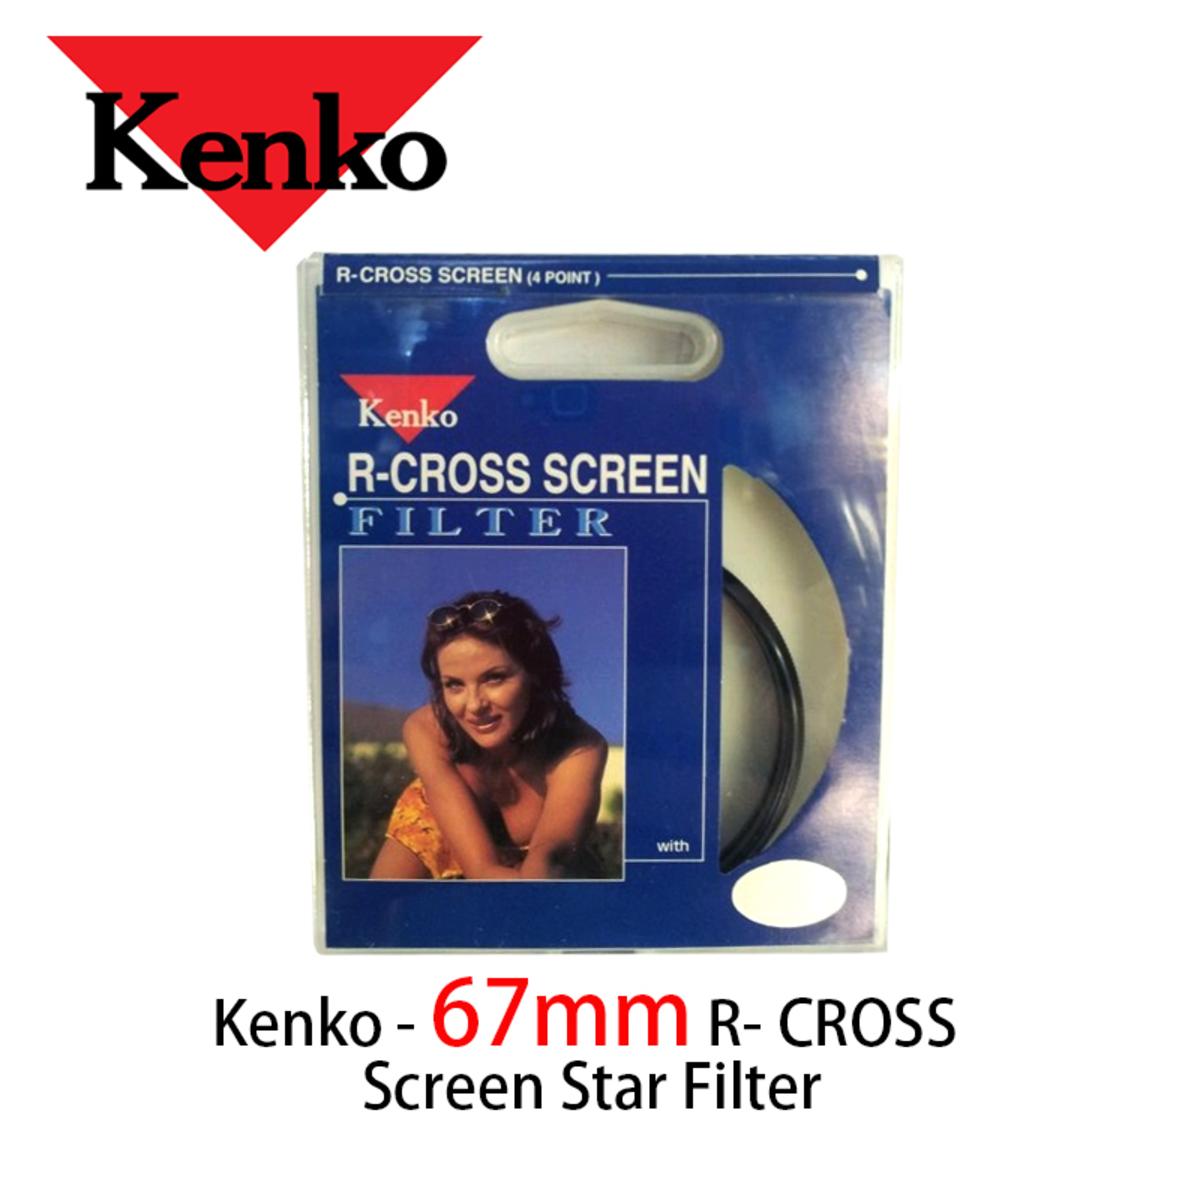 67mm R- CROSS Screen Star Filter